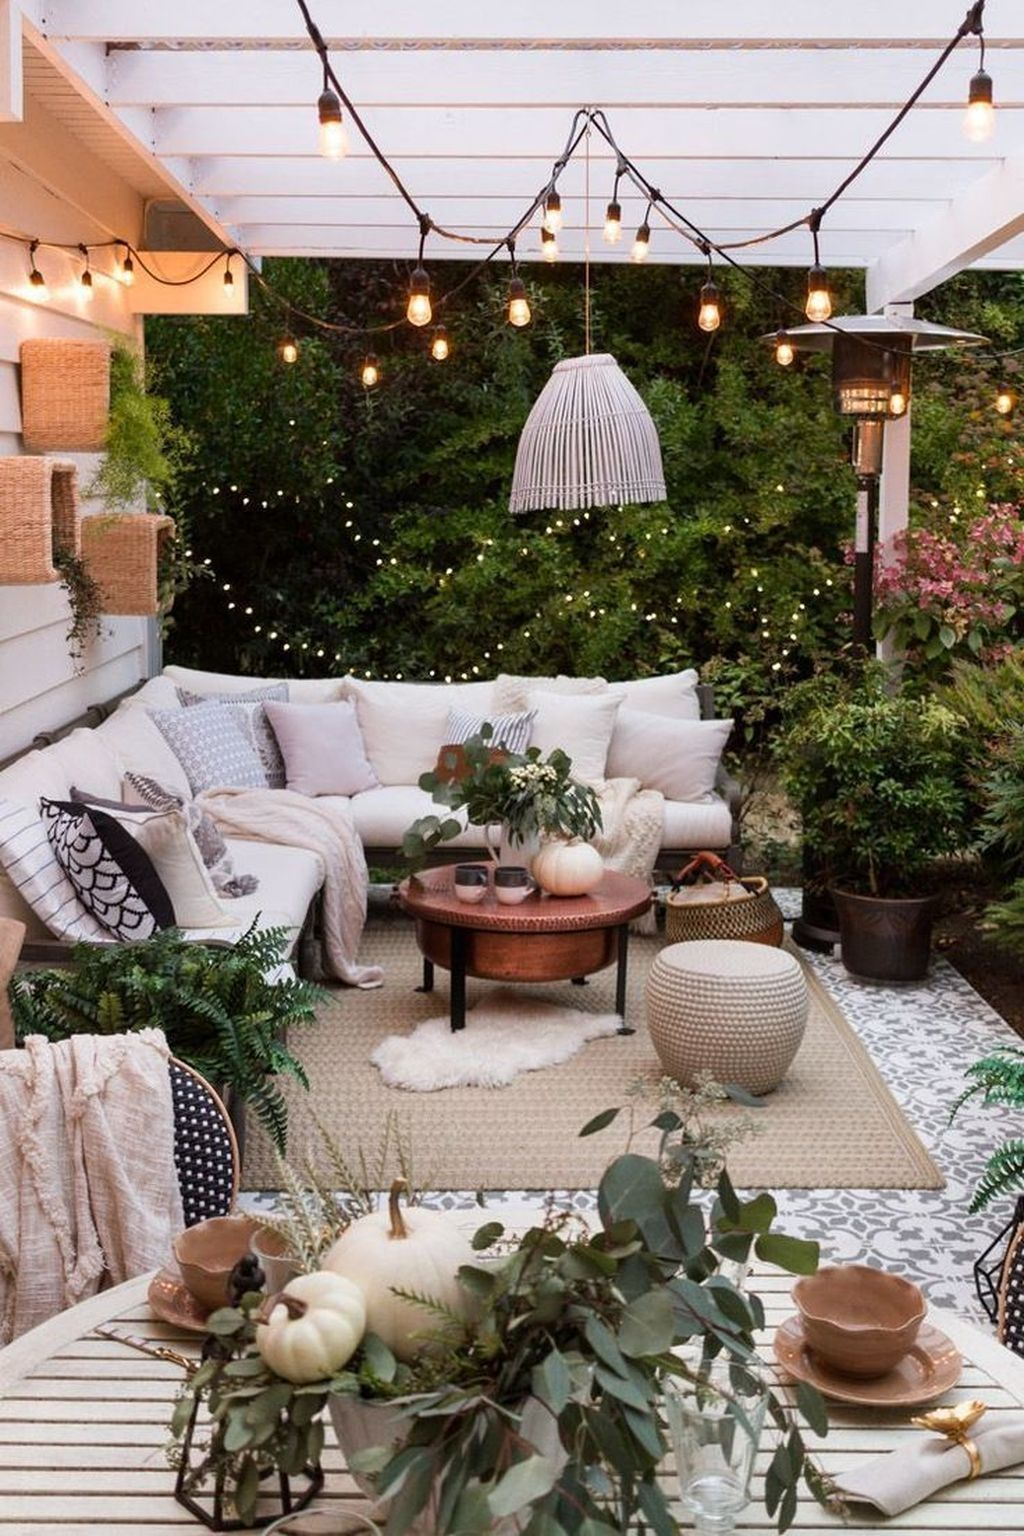 56 Wonderful Backyard Decorating Ideas